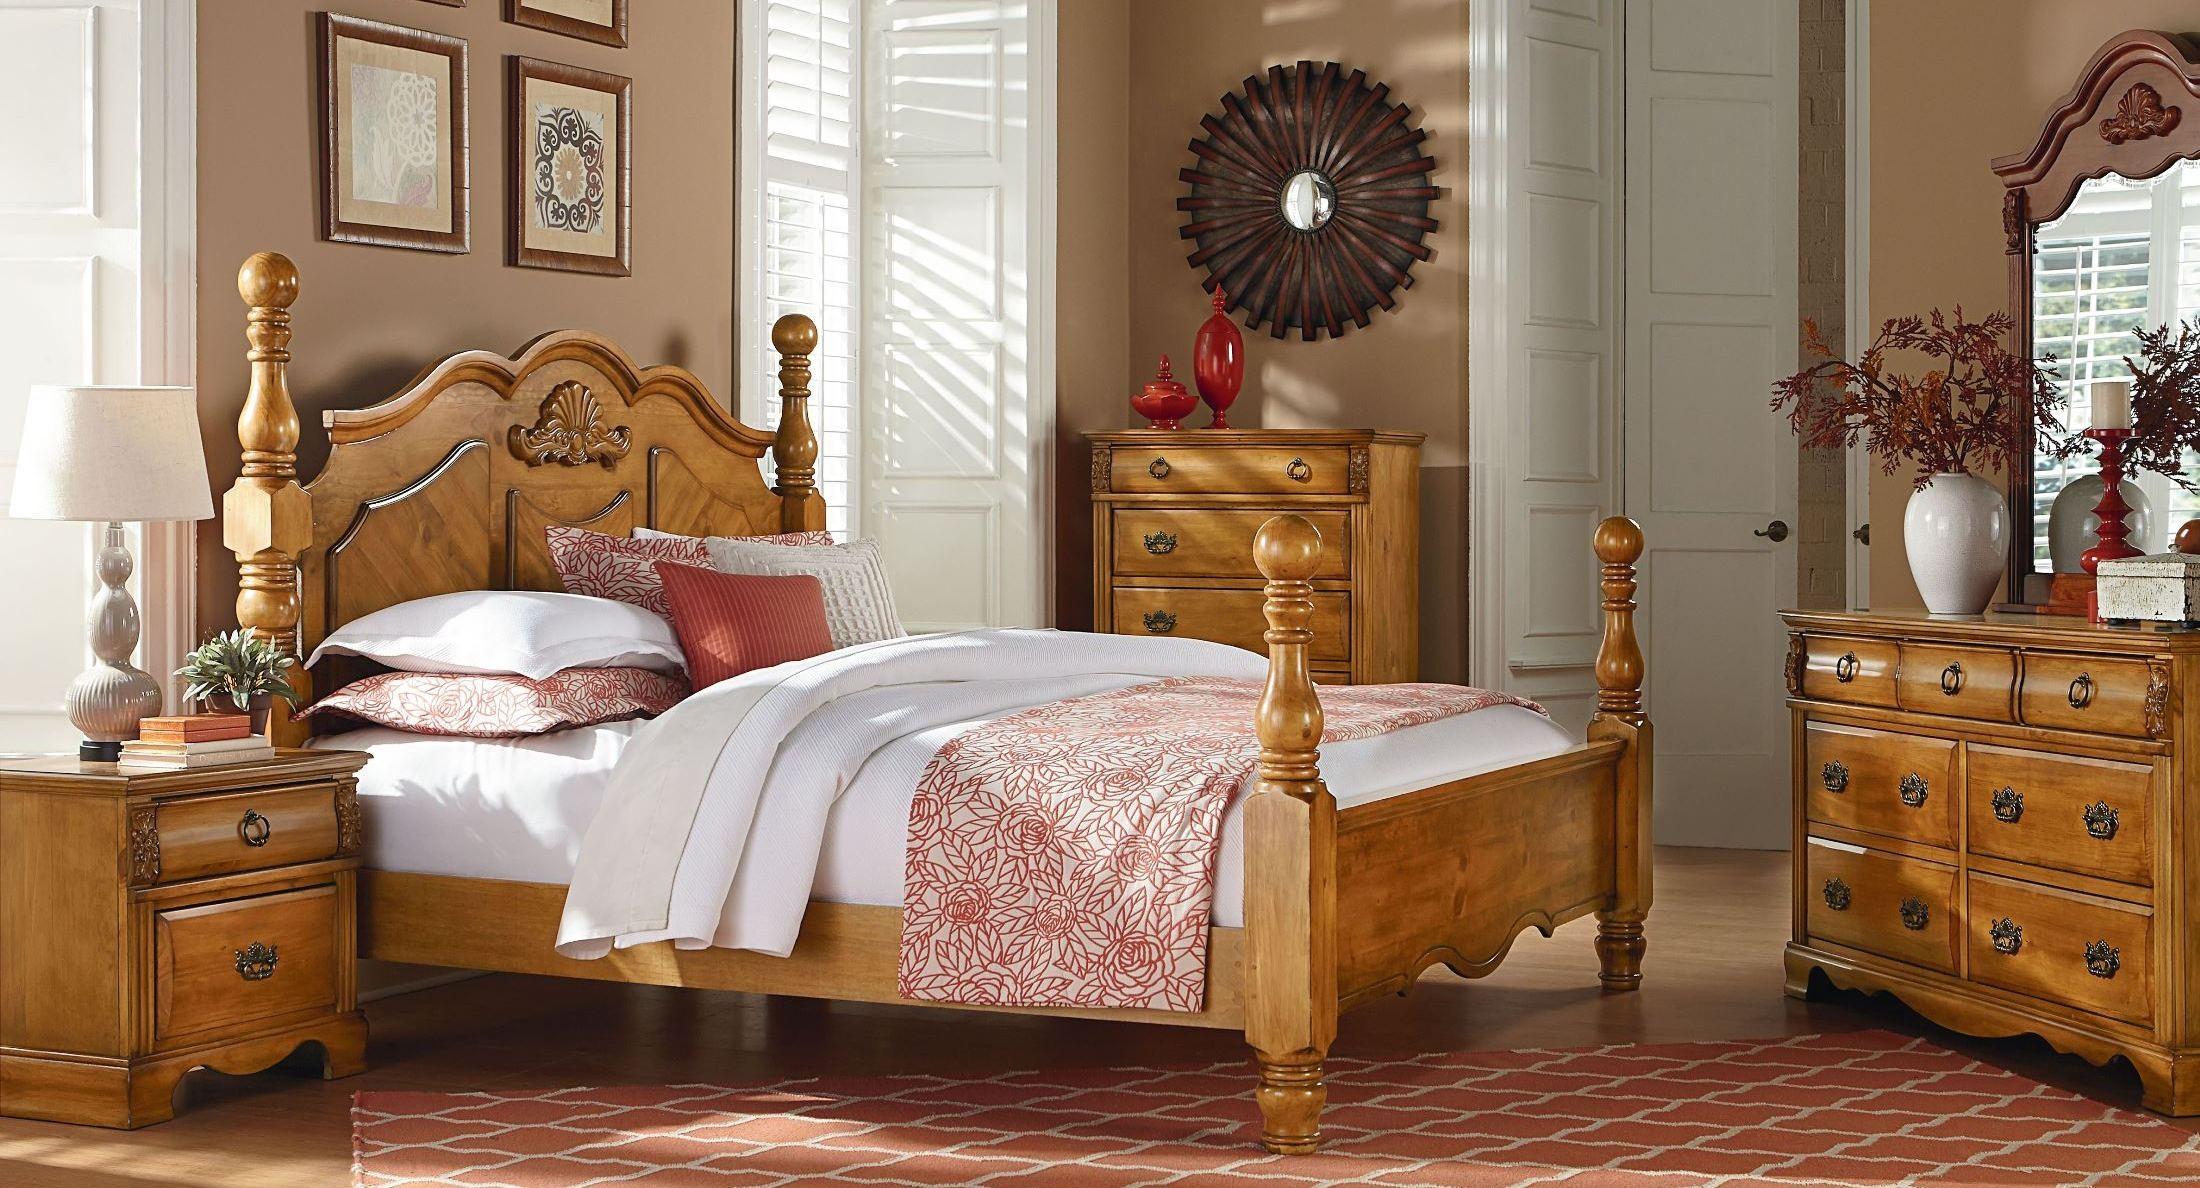 Geor own Golden Honey Pine Poster Bedroom Set from Standard 83